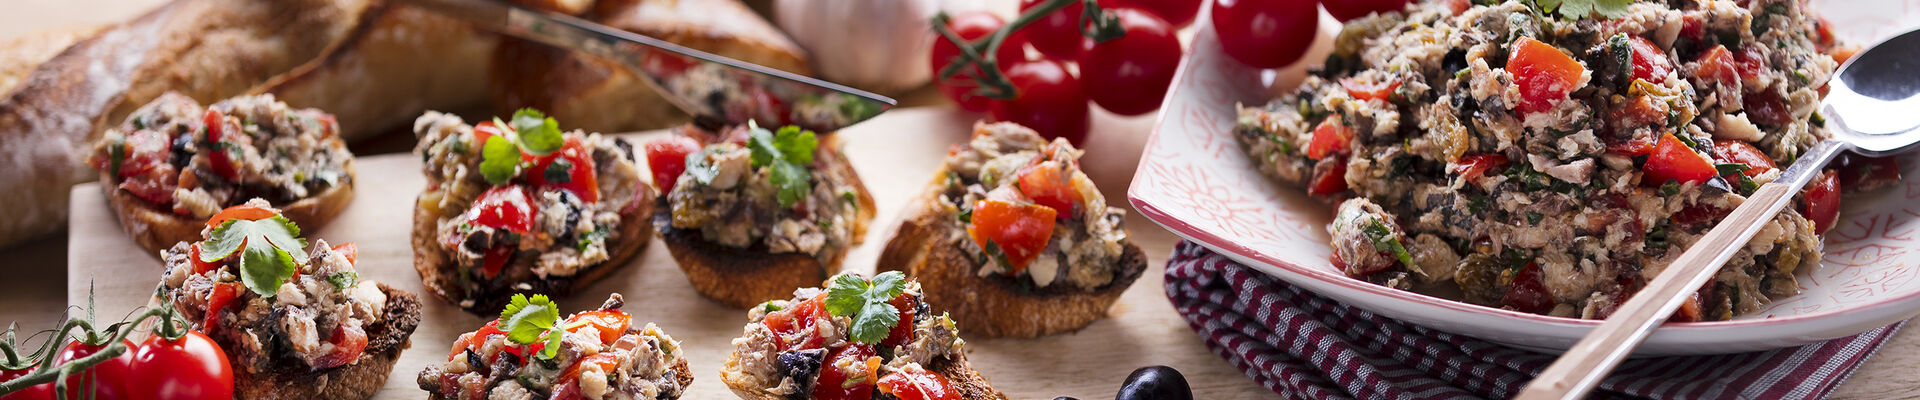 Bruschettas tomate sardine